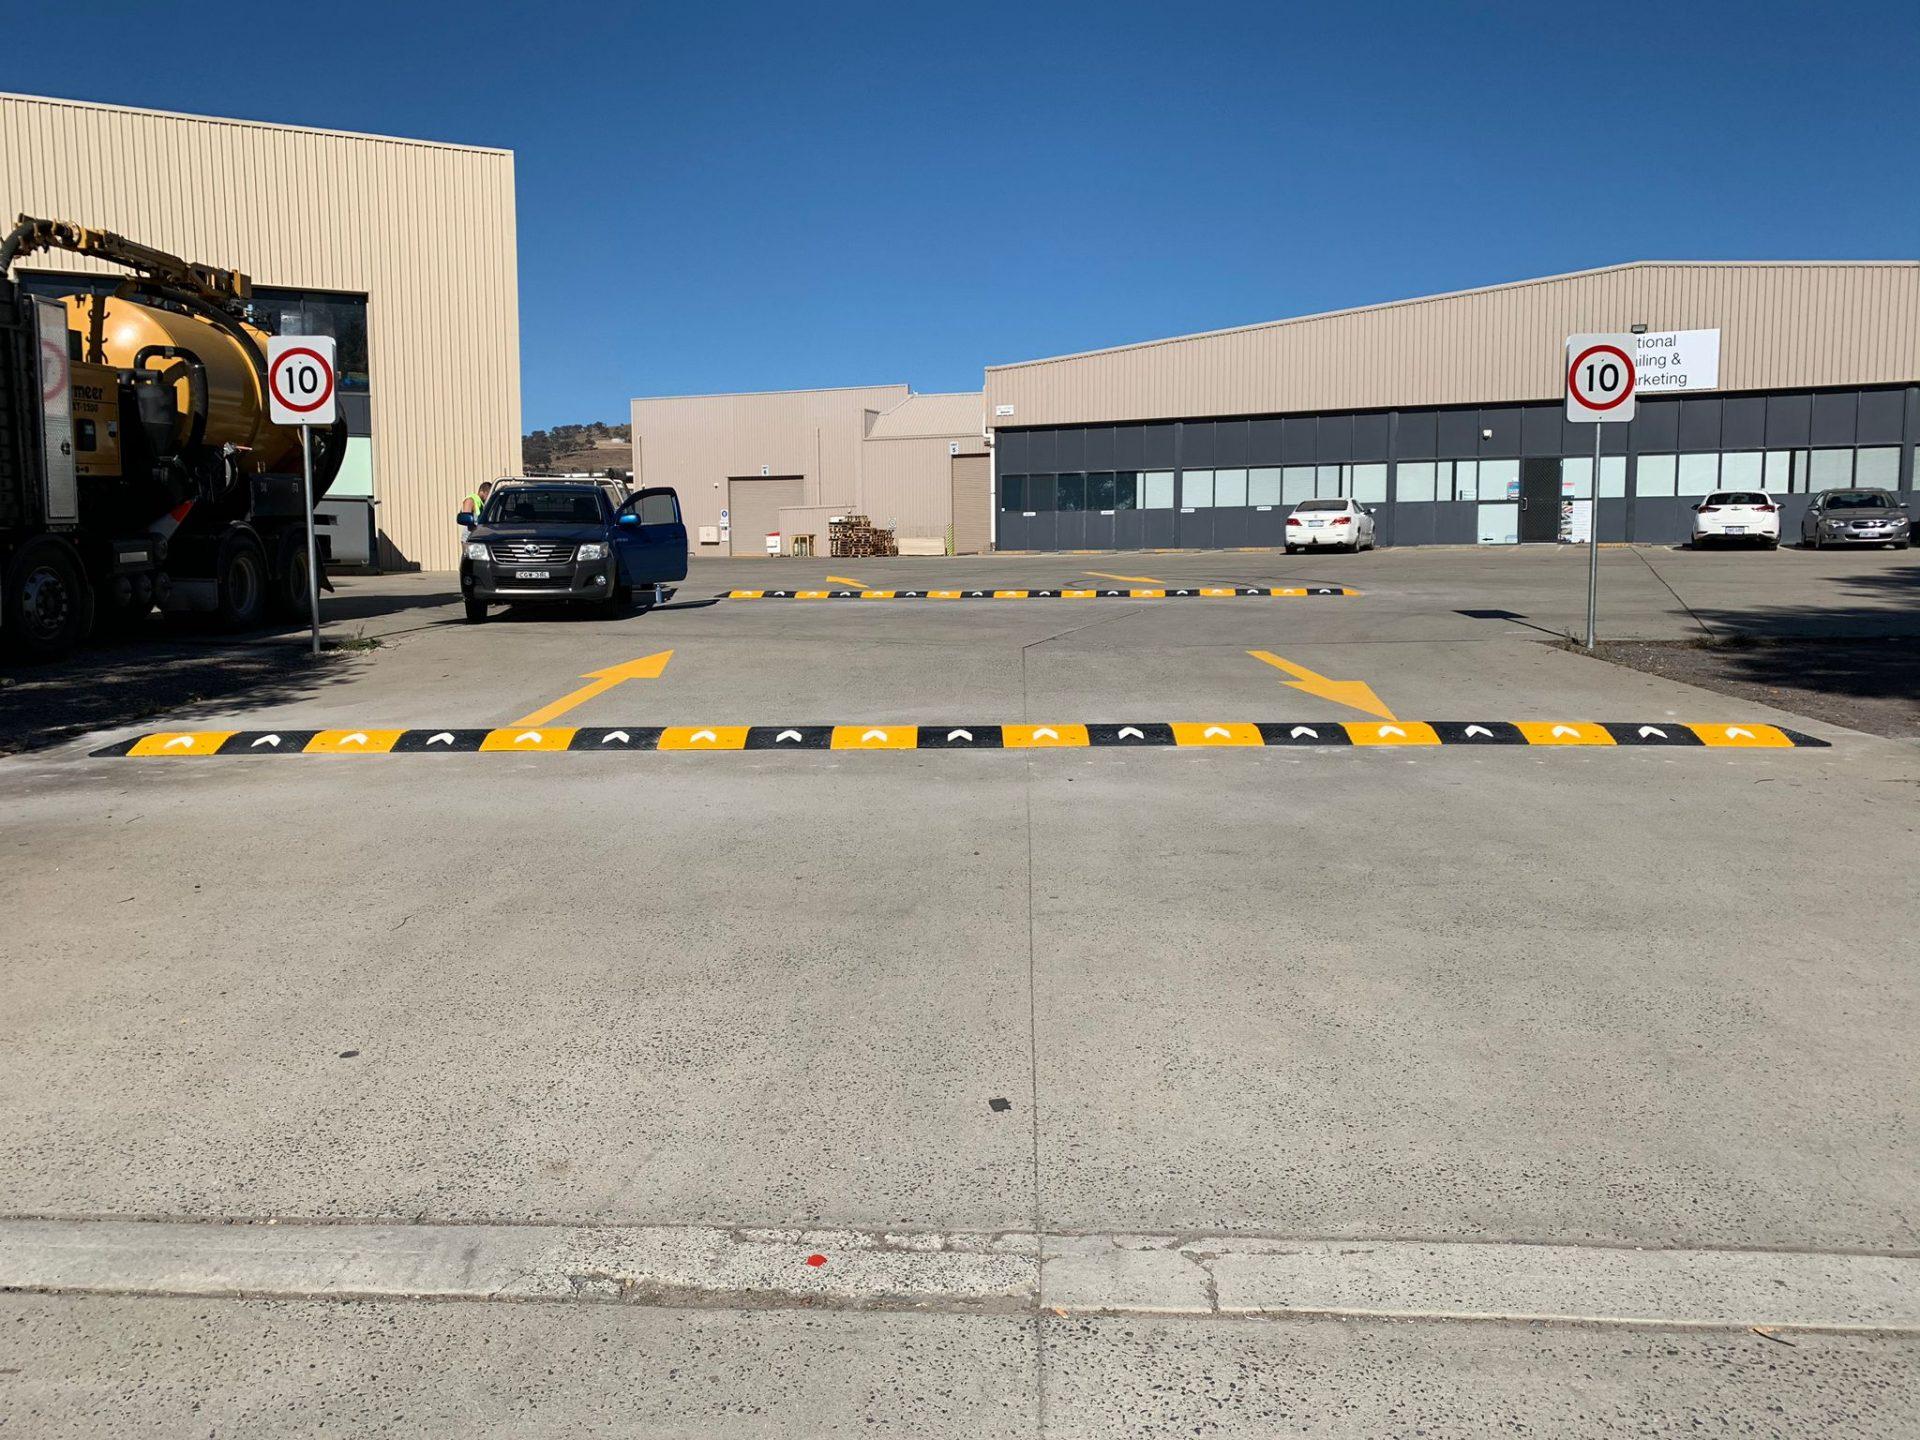 Car Park & Workplace Safety